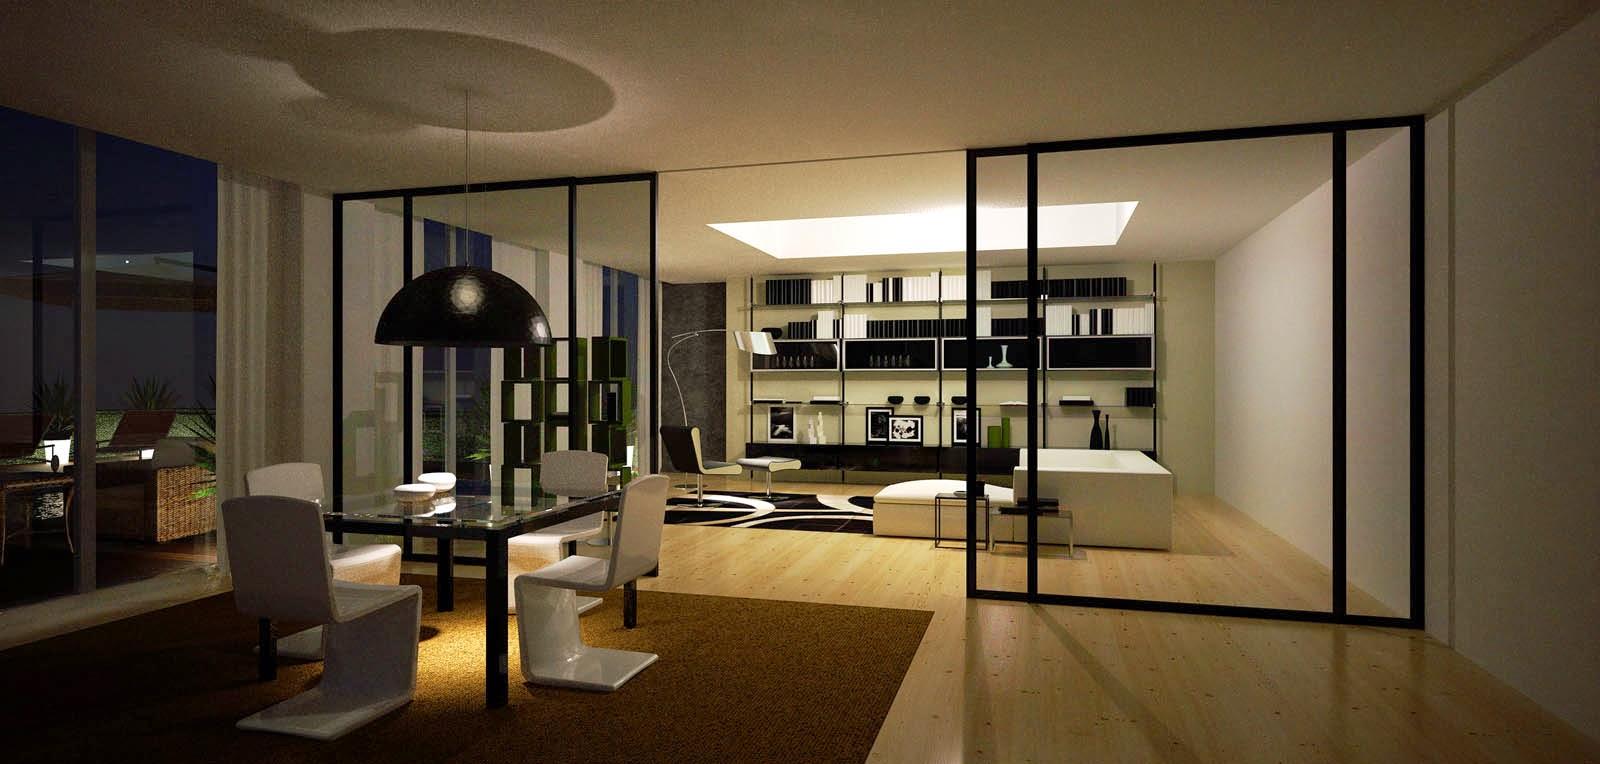 Interior Design  Free downloads and   downloadcnetcom